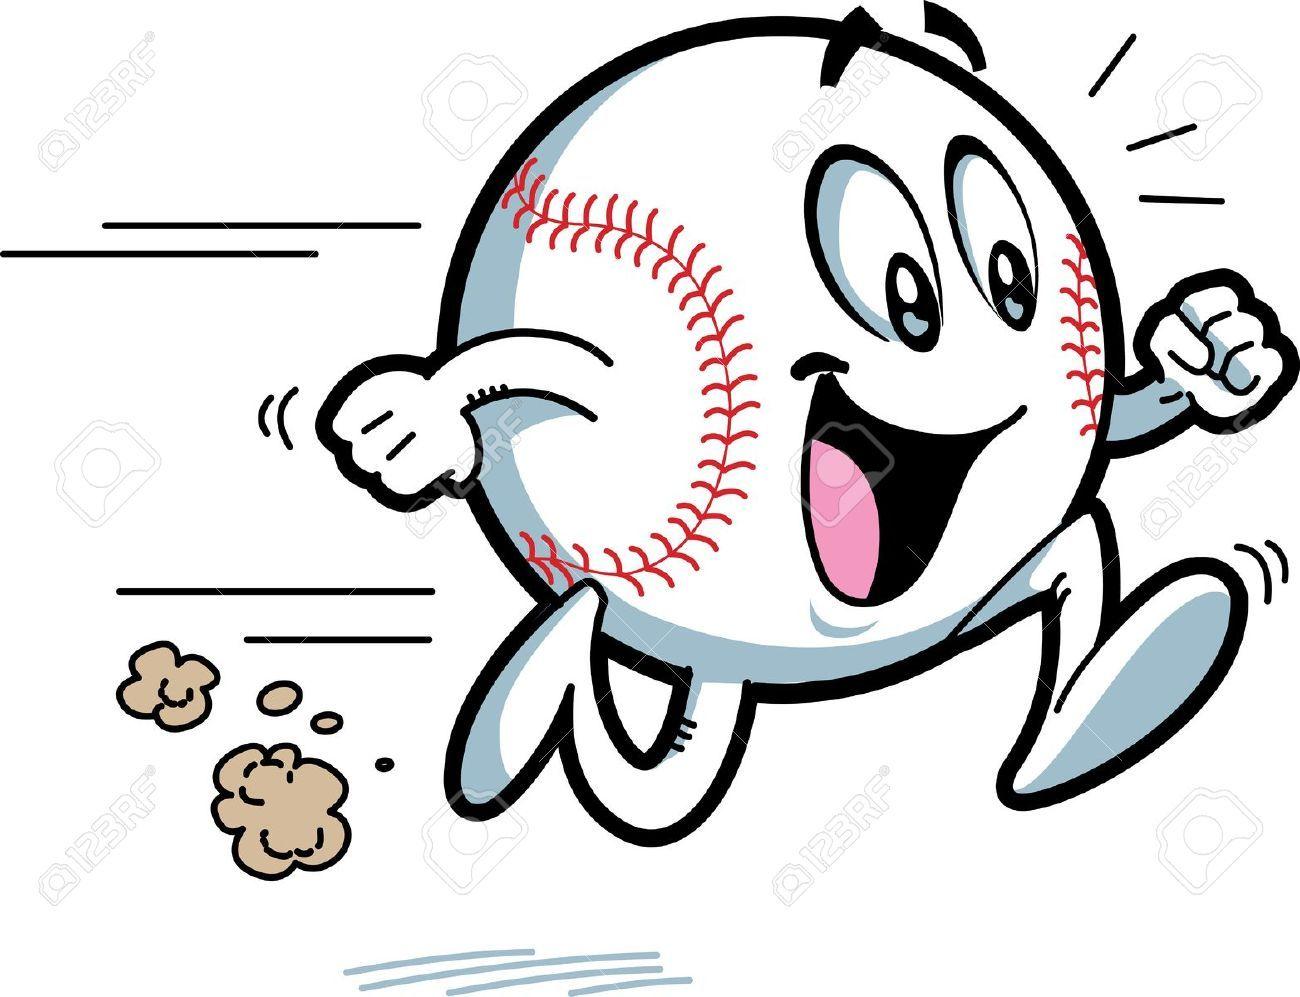 Animated Cartoon Happy Running Baseball With Big Smile